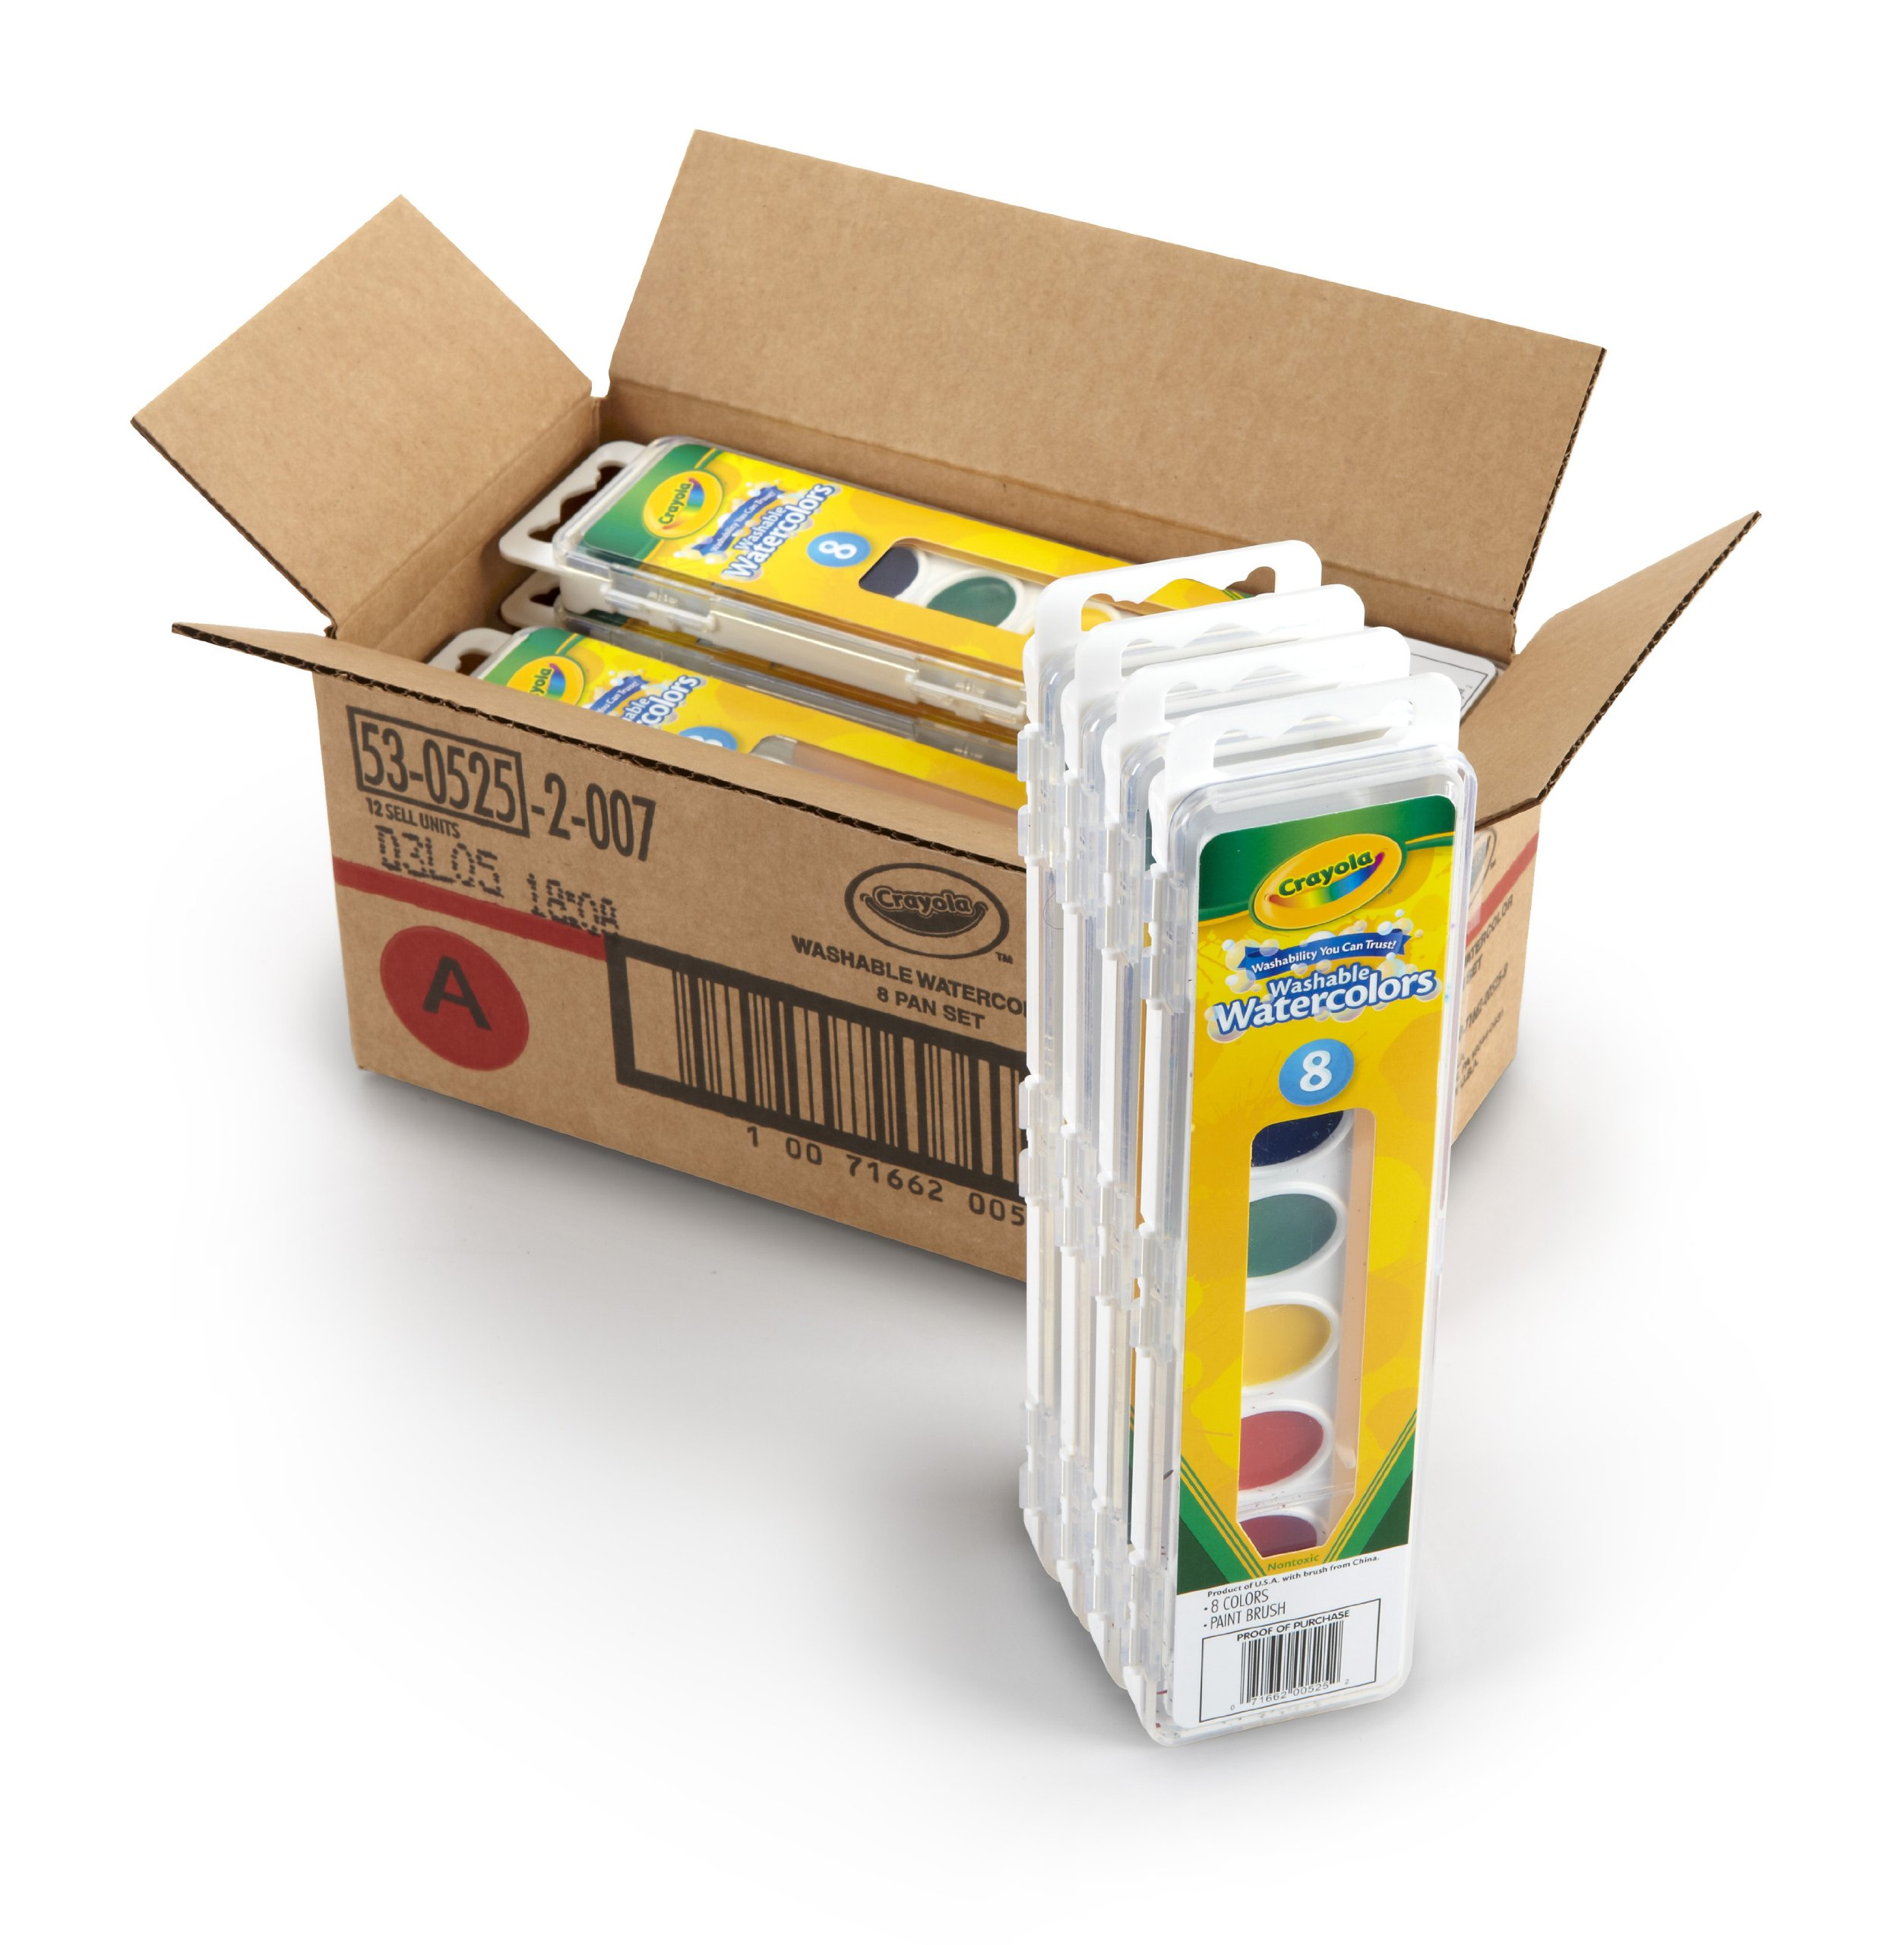 Crayola 53-0525-1 8 Pan Set Washable Watercolors, 12 Pack by Crayola (Image #3)